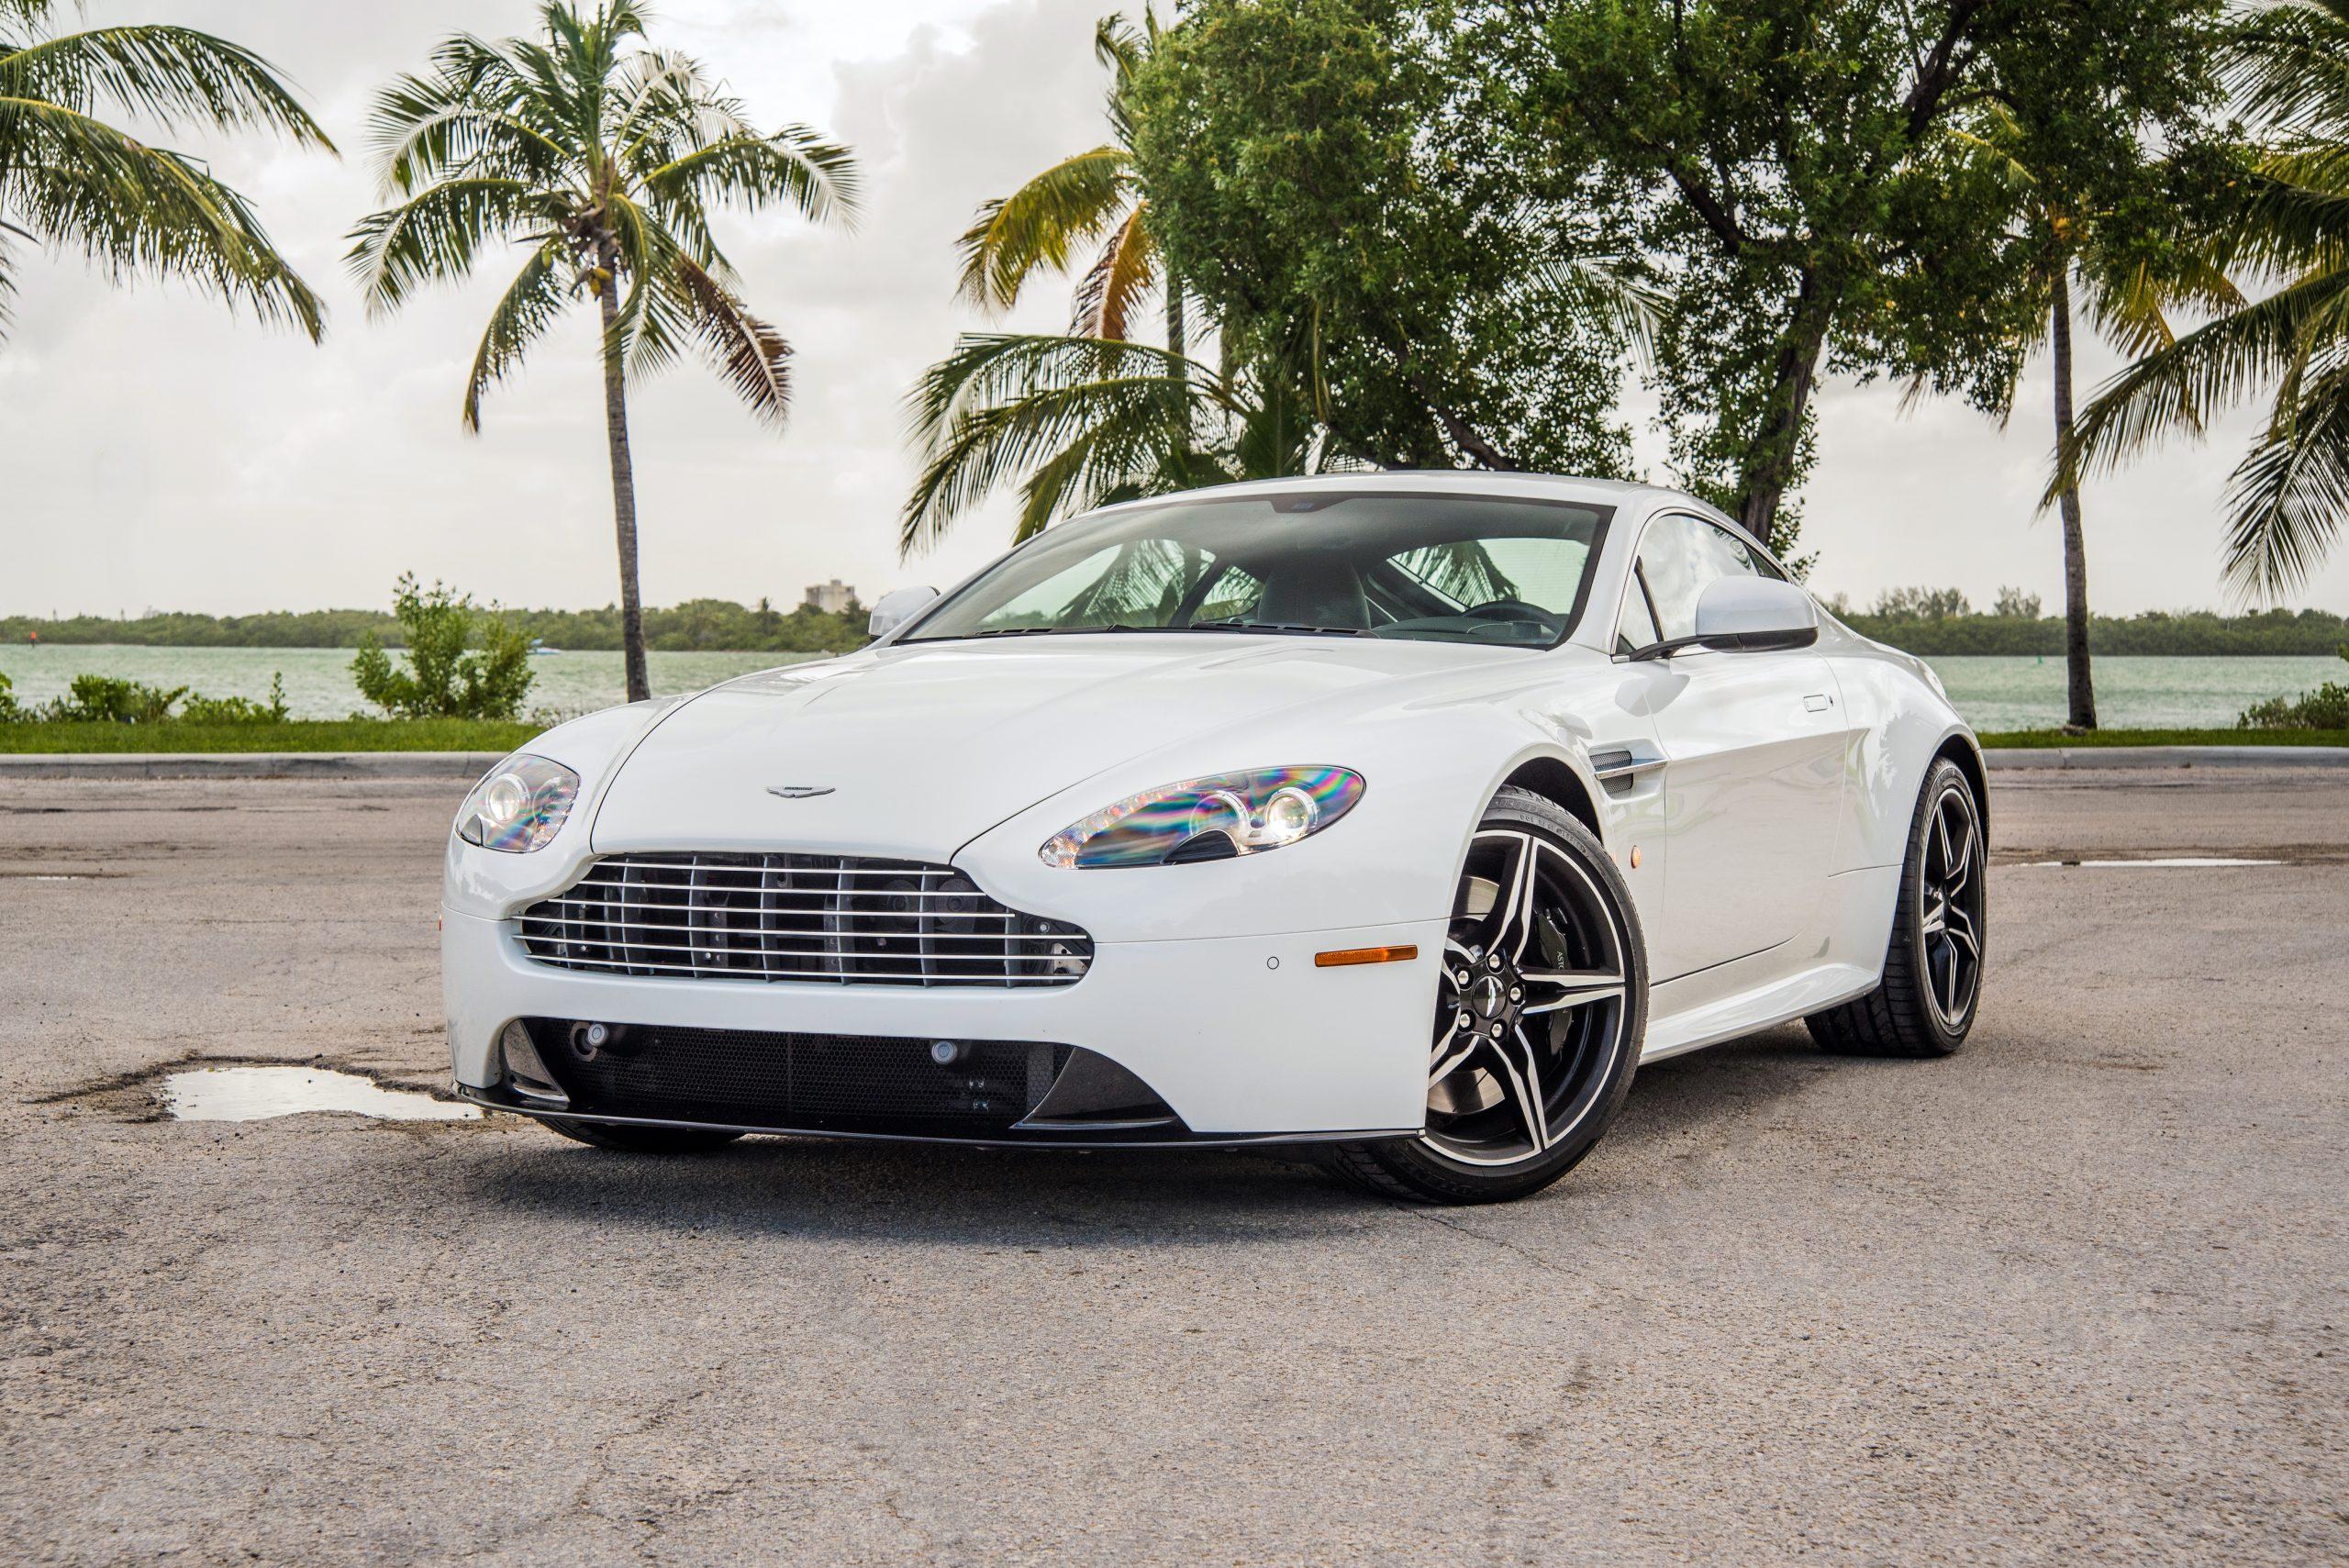 Aston Martin Vantage Gts Rental In Miami Premier Auto Miami